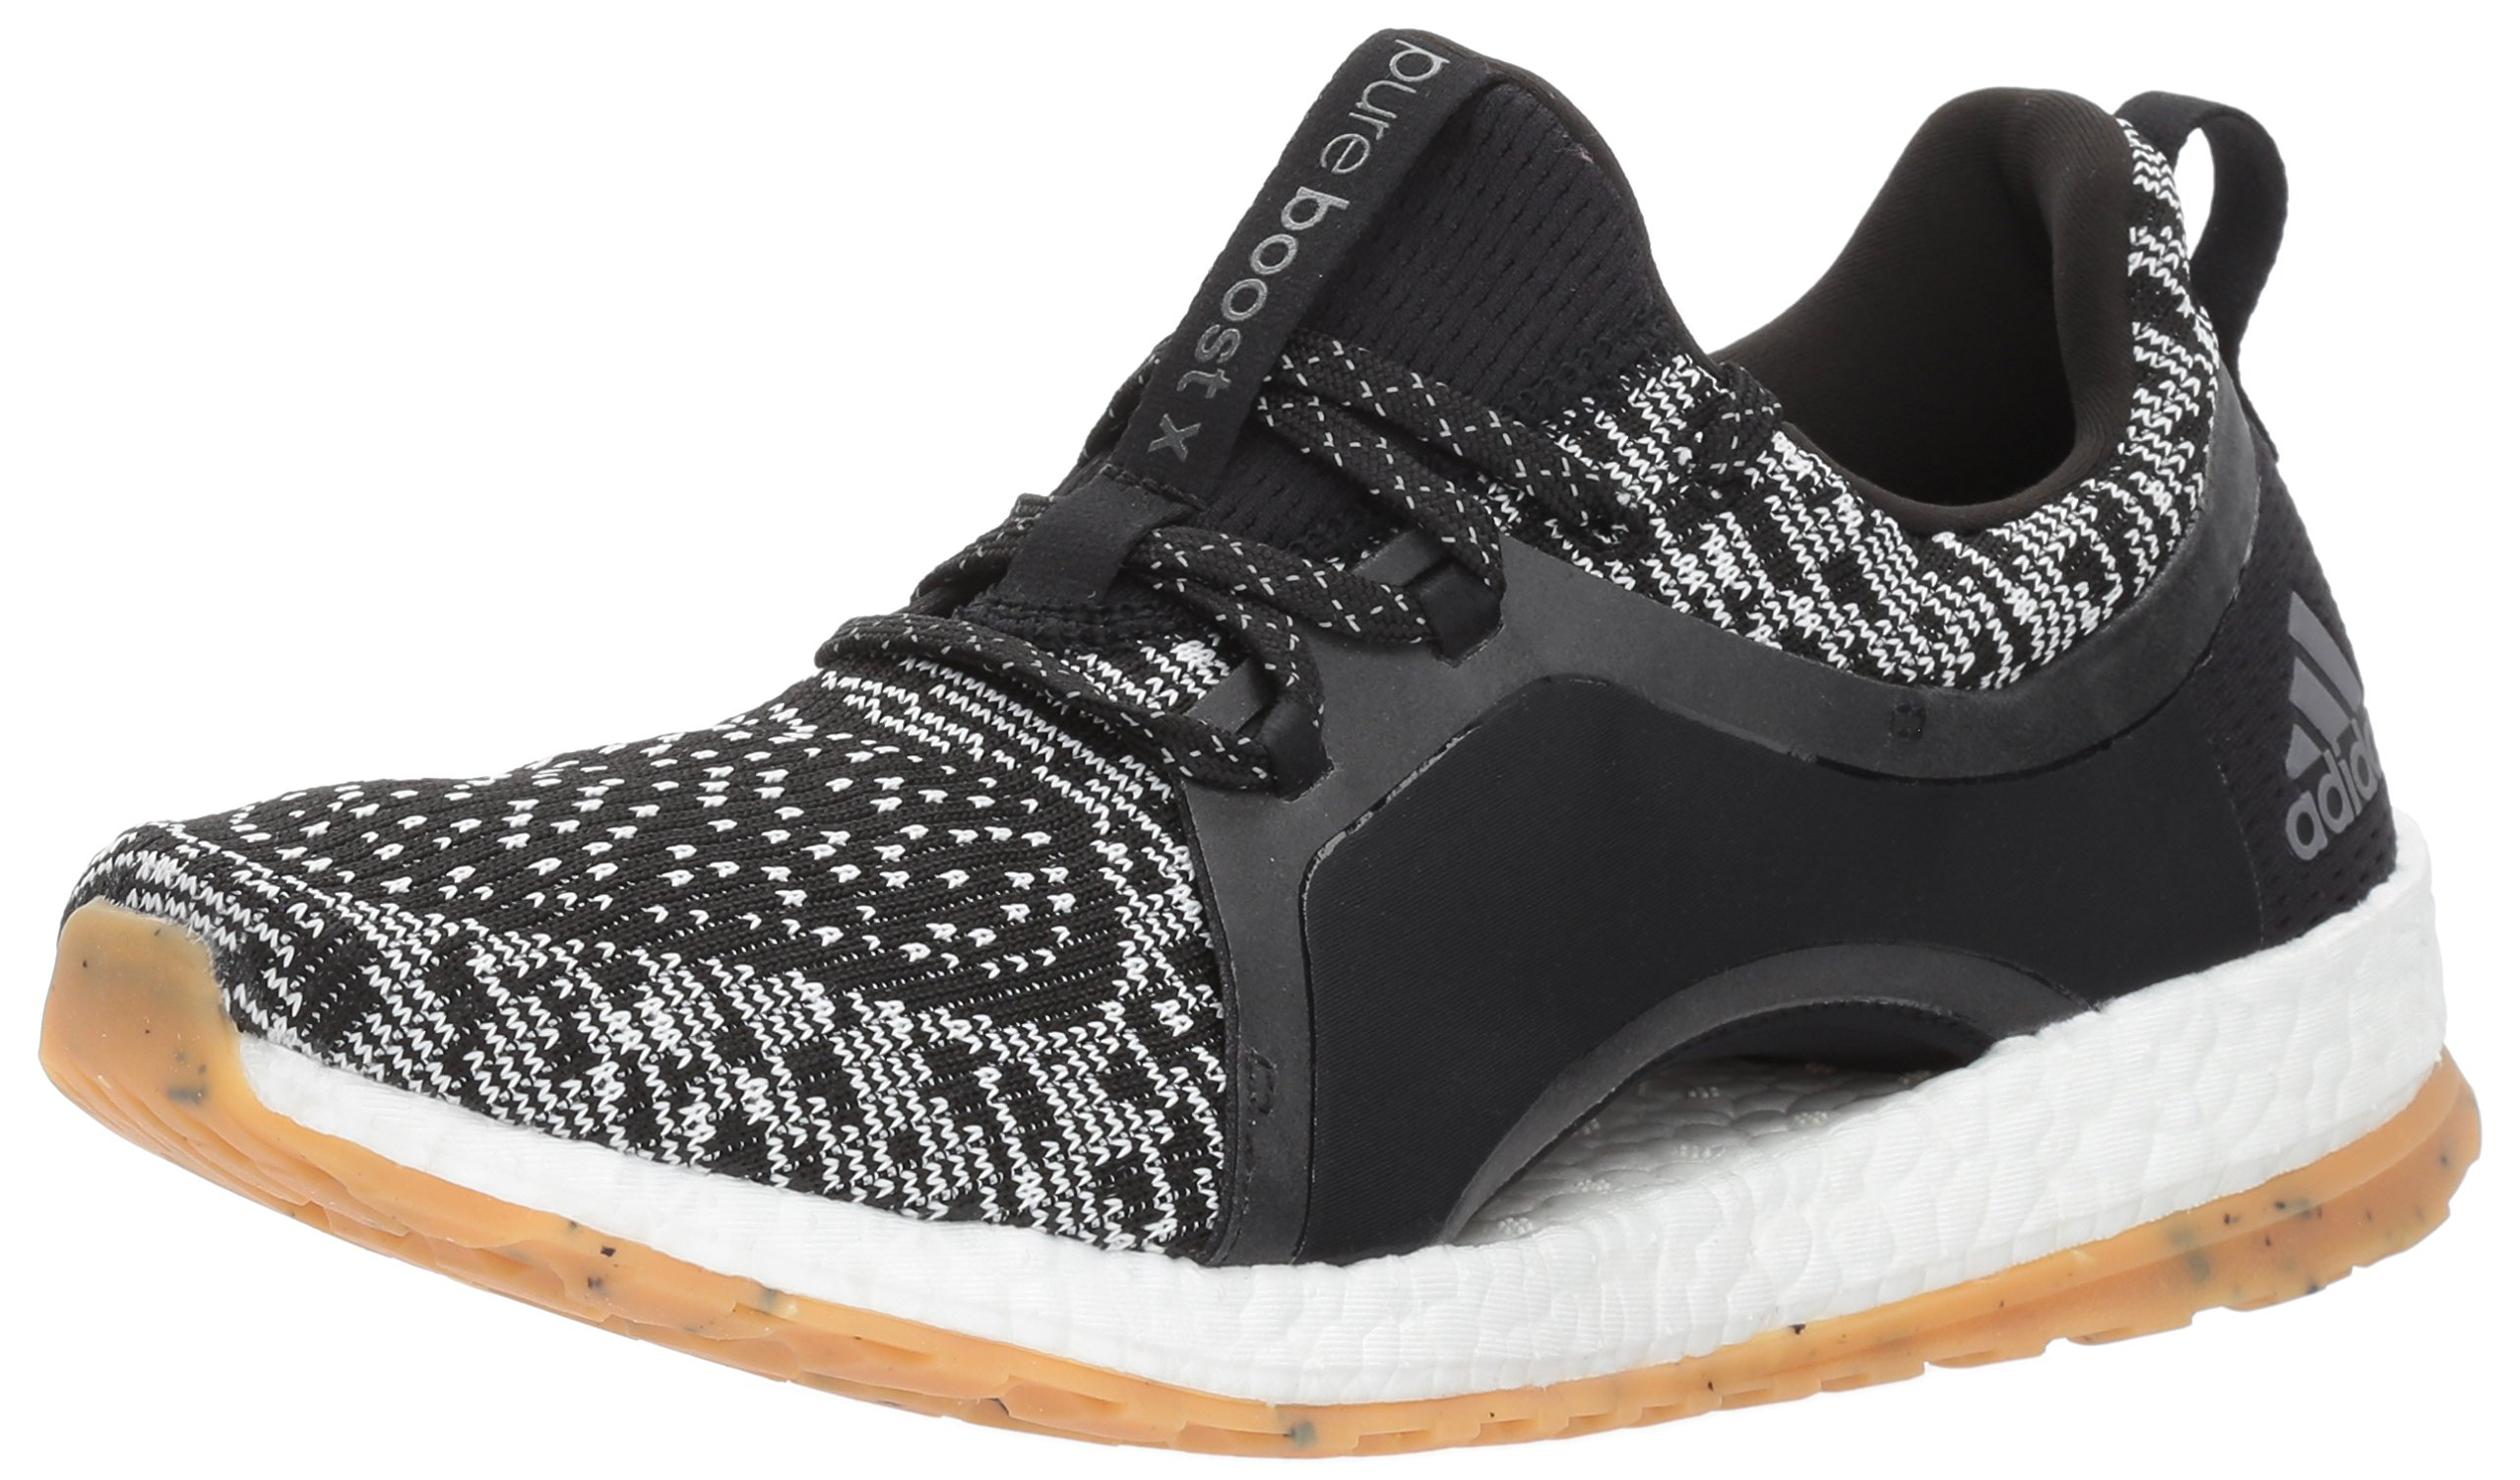 industria Principiante Por cierto  Adidas Women's Pureboost X ATR Running Shoe, Black/White/Black, 10 ...